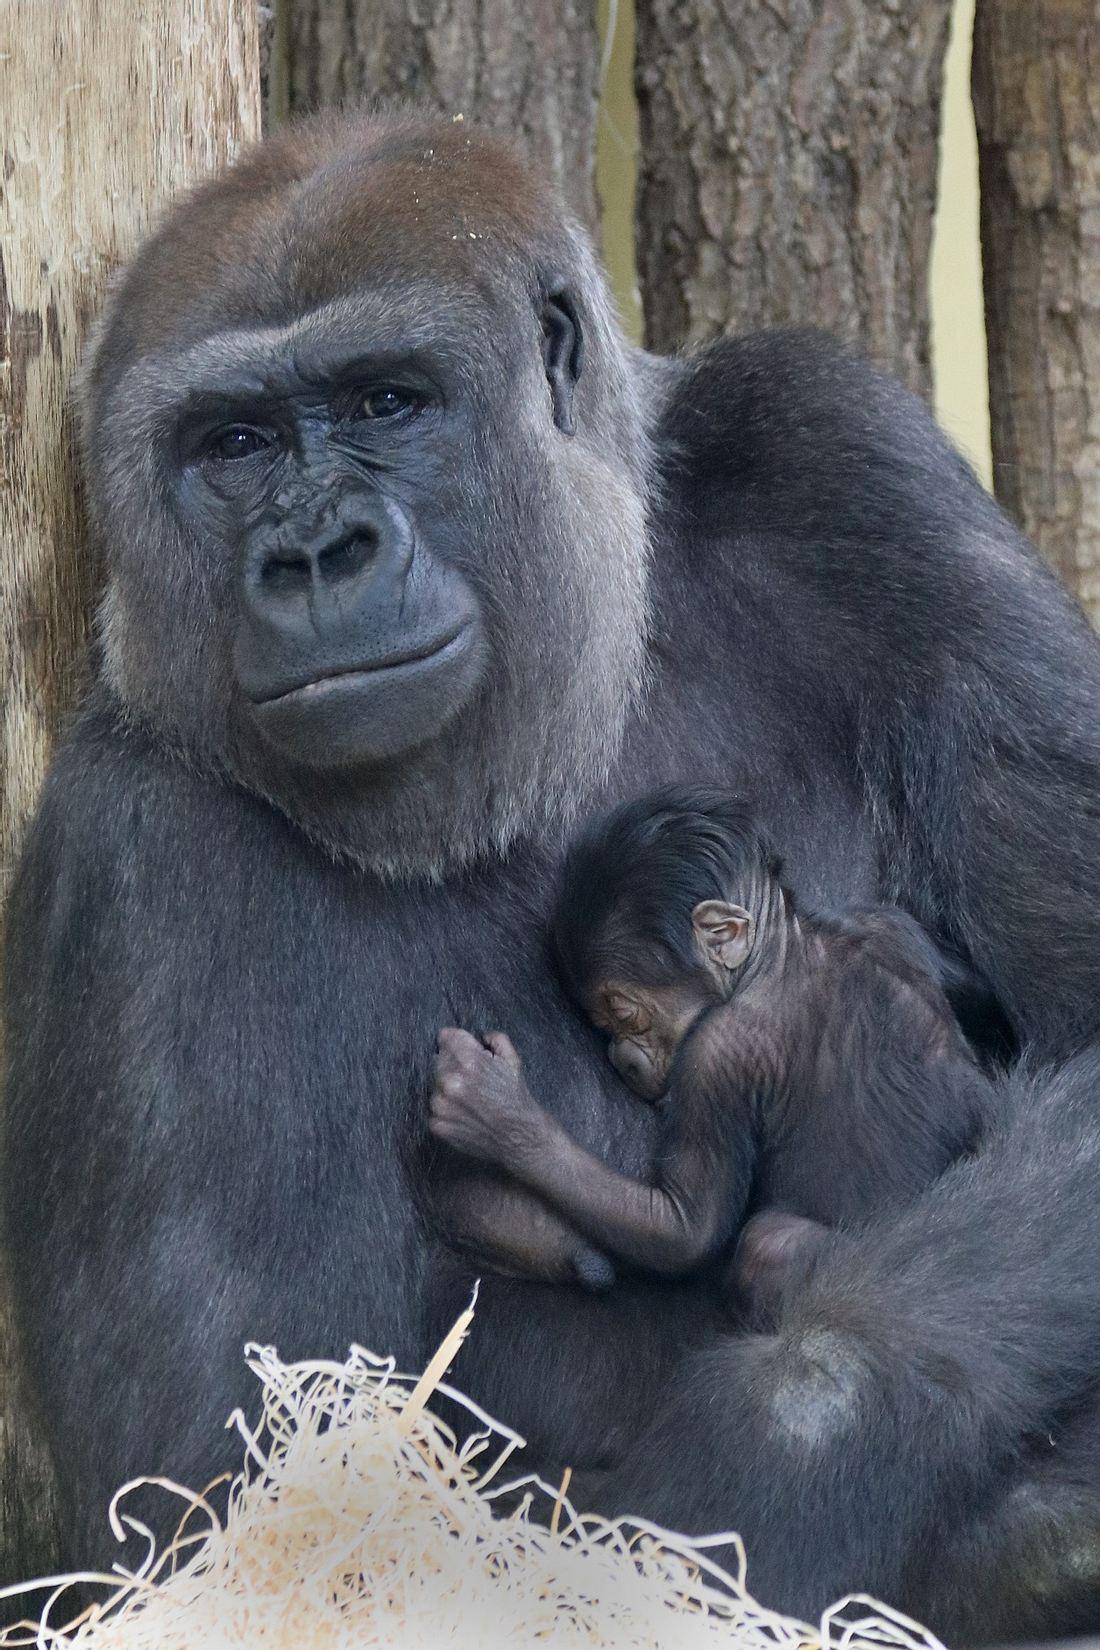 Gorilla-Baby im Zoo Berlin